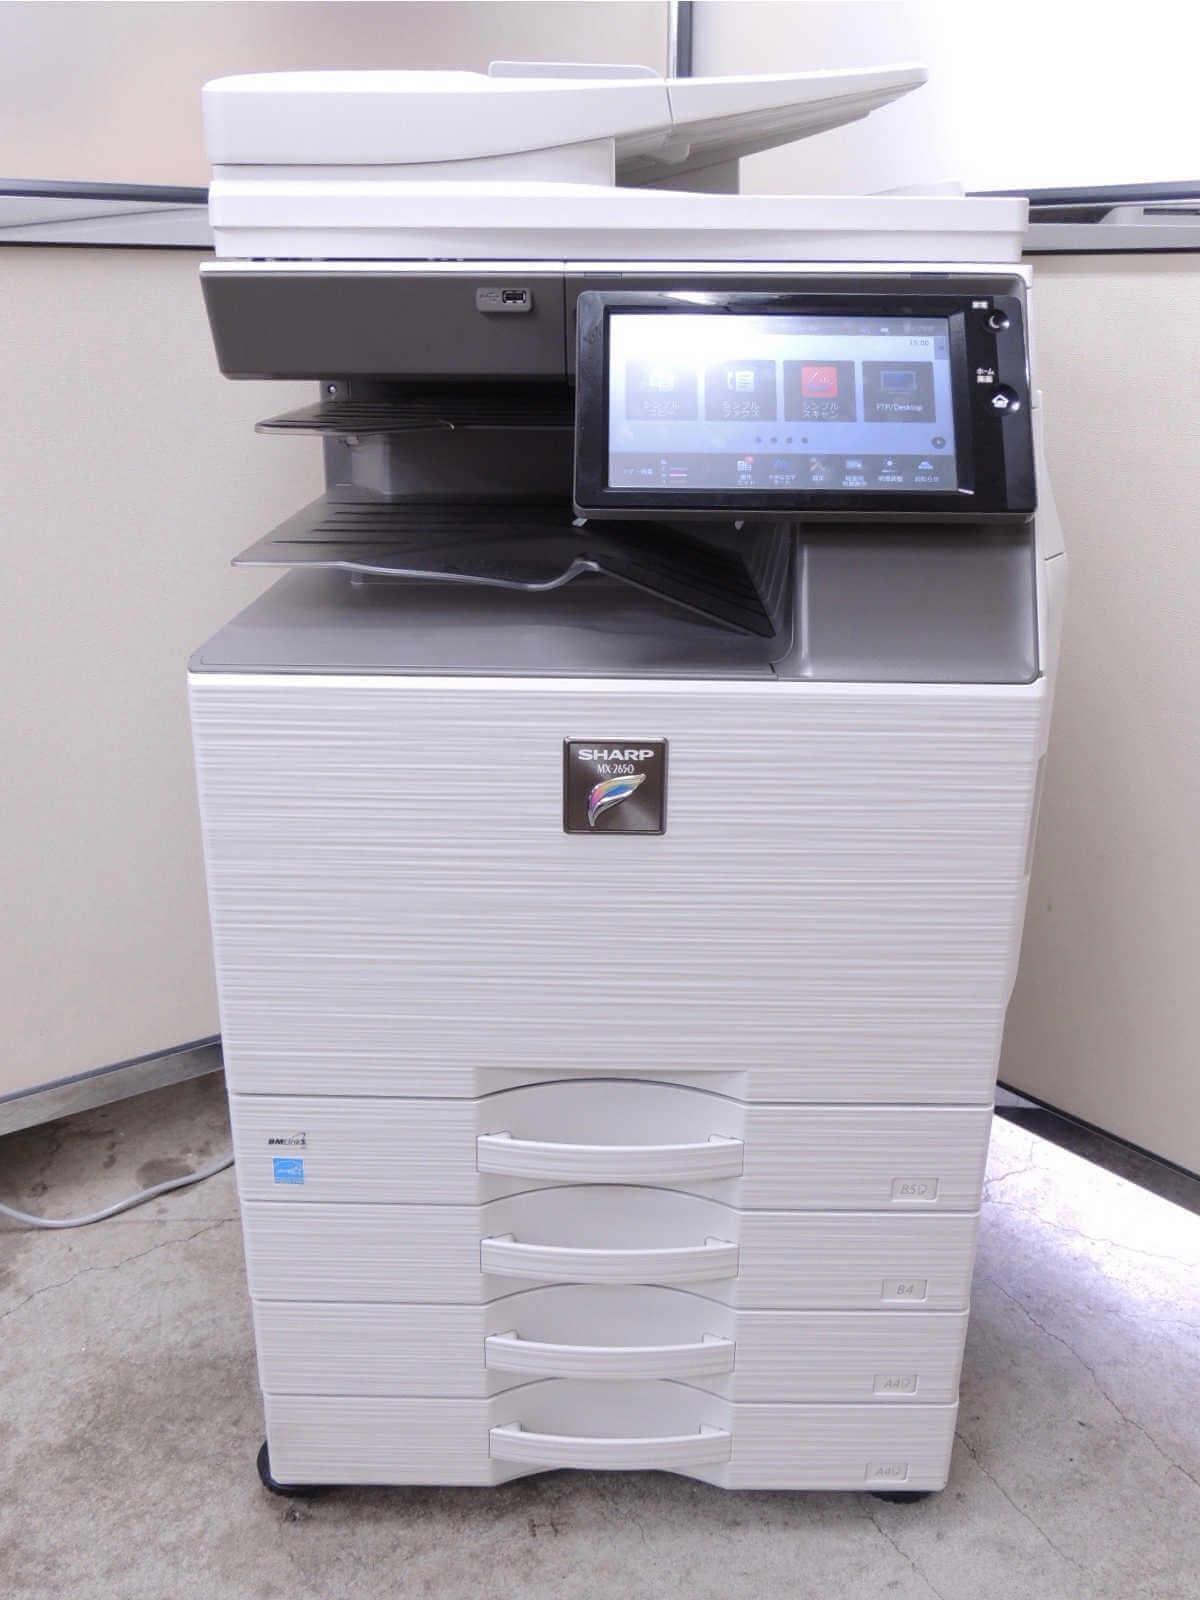 SHARP MX-2650FN-中古カラー複合機-Mac対応、4段給紙、2017年製